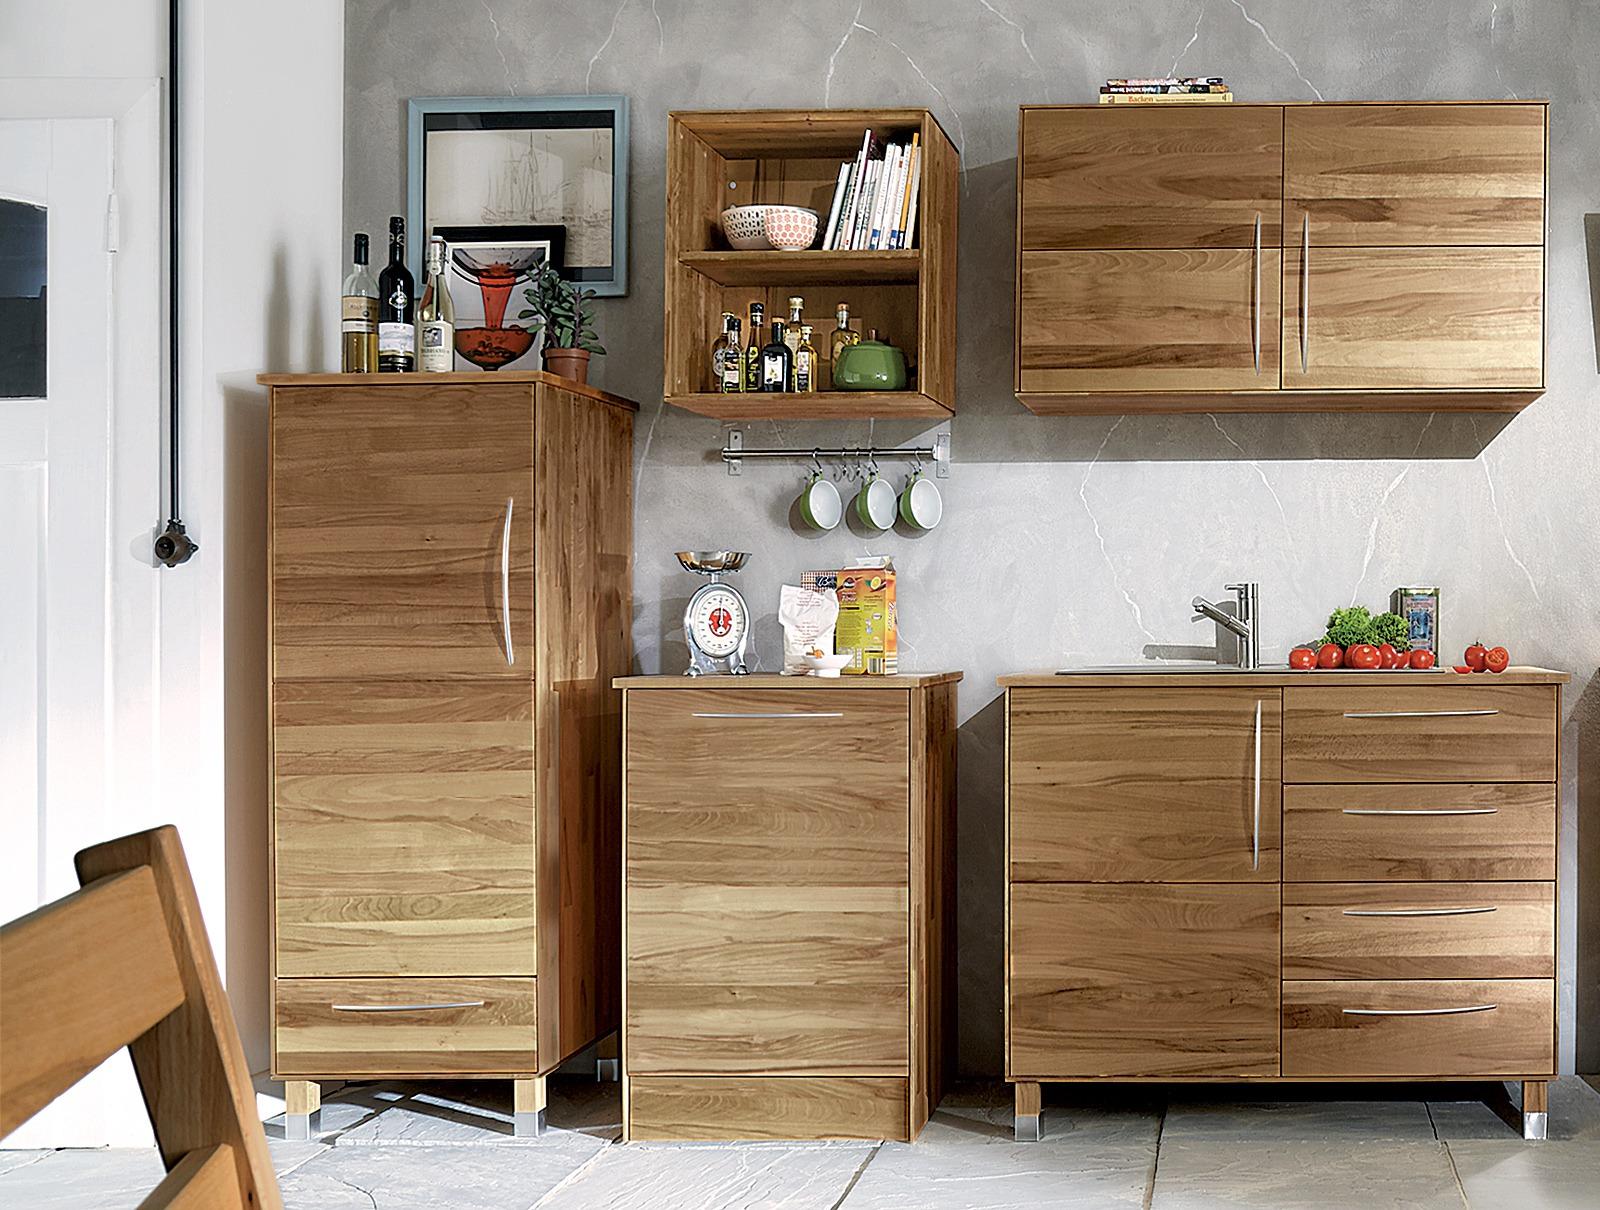 Kühlschrankumbauschrank : Kühlschrankumbauschrank florenz incl einbau kühlschrank cm